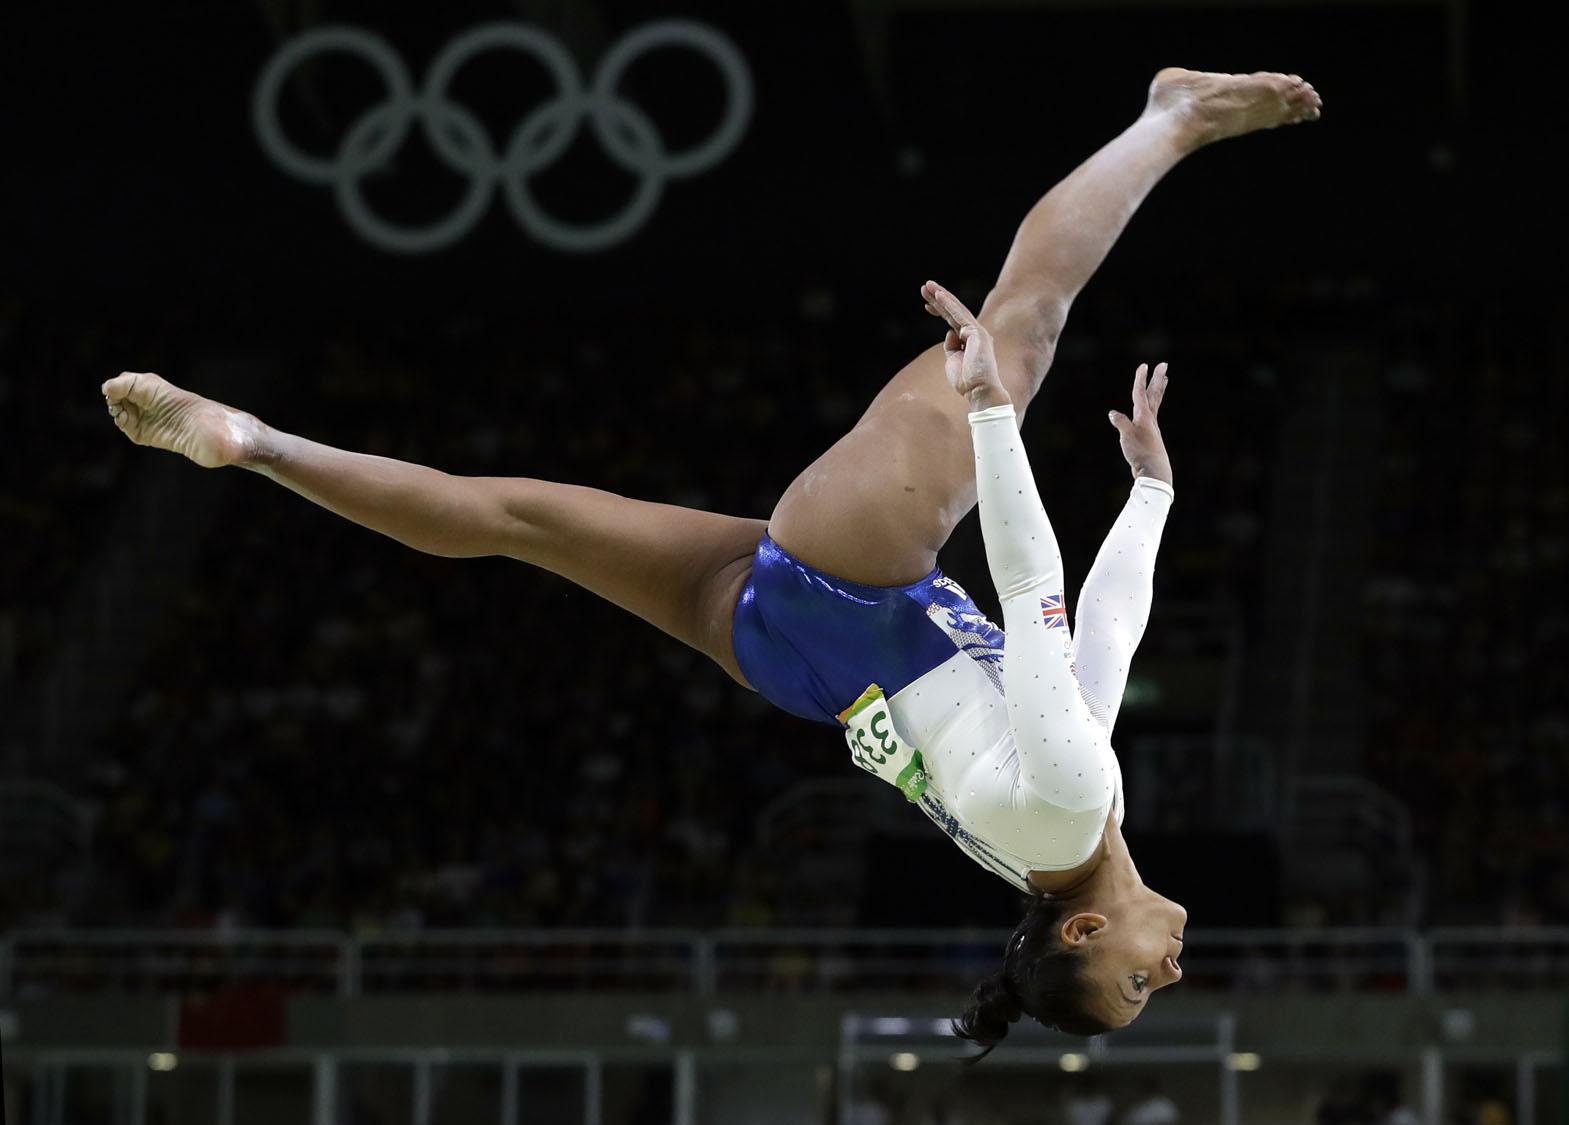 artistic gymnastics Olympics information including milestones and stars of artistic gymnastics on espncom.